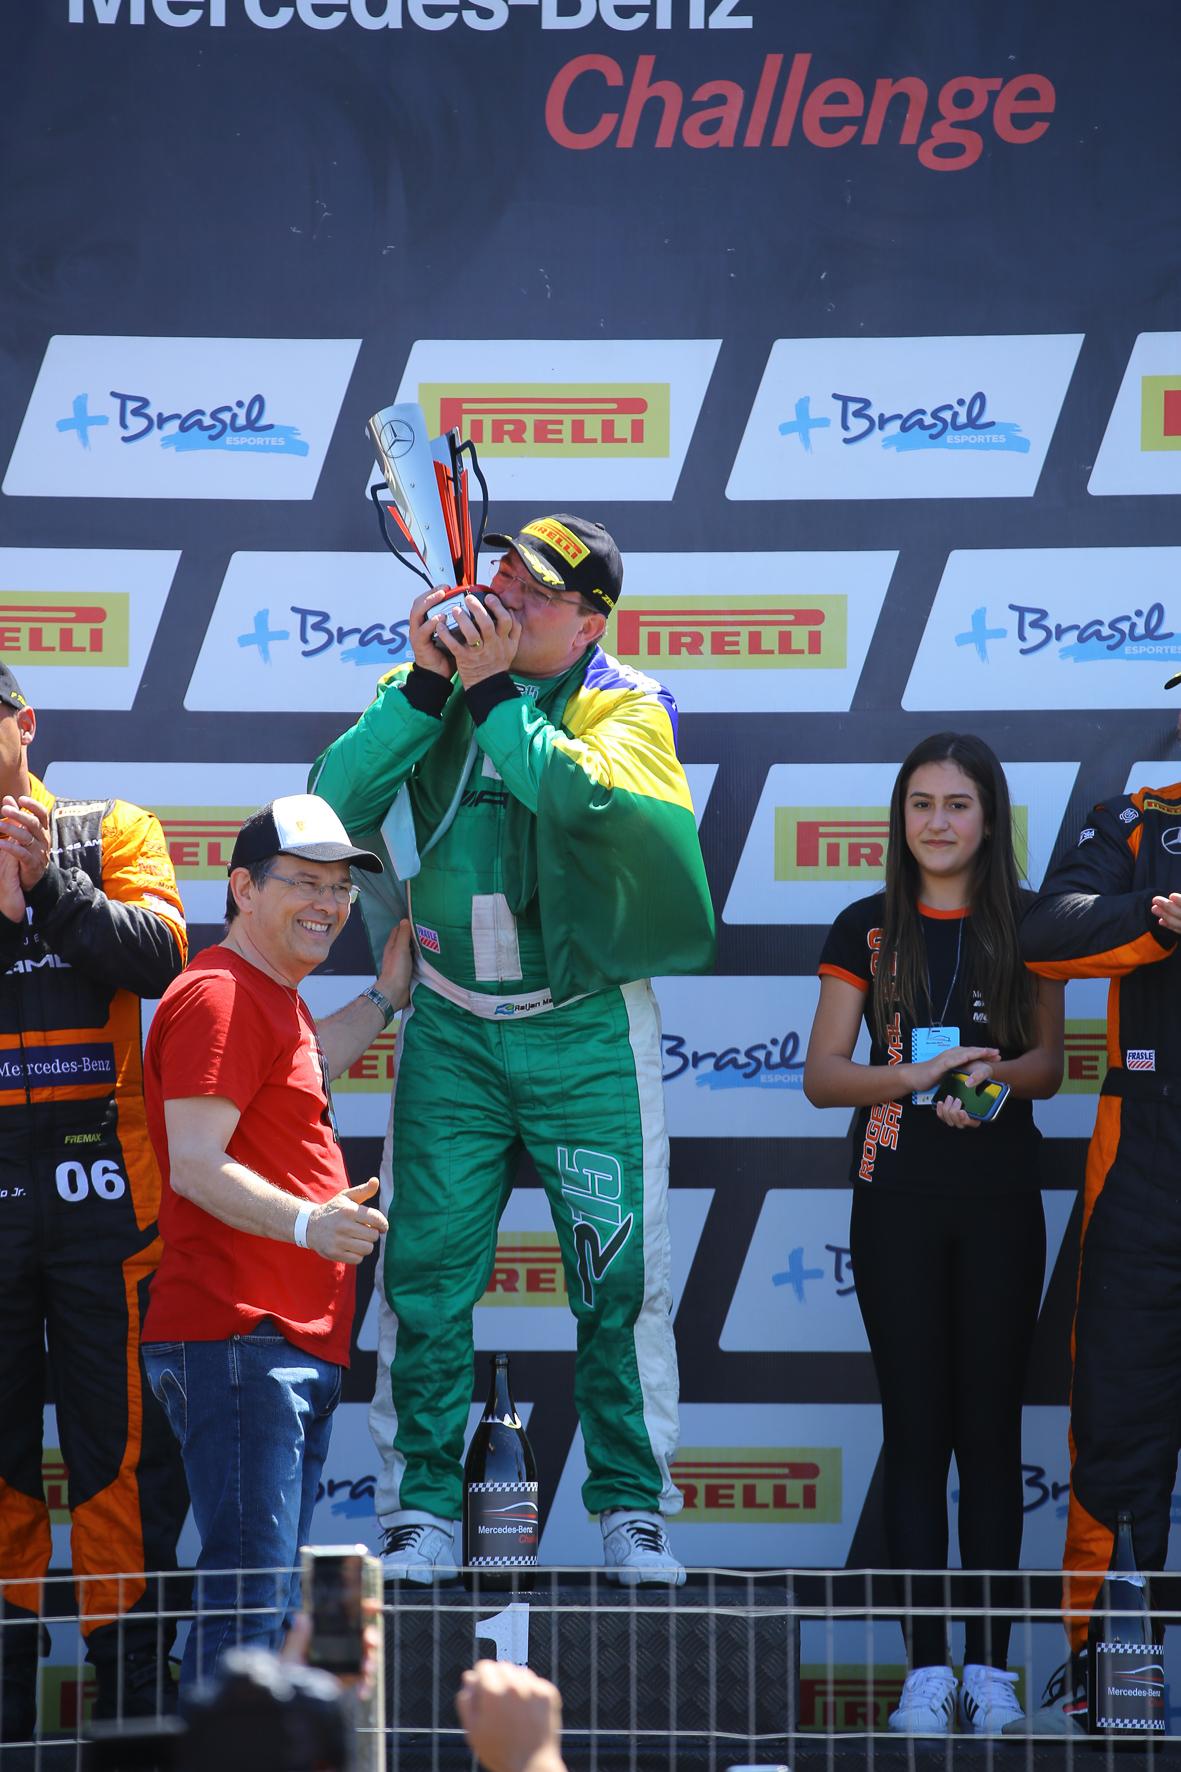 Photo of Mercedes-Benz Challenge – Mascarello e Moraes Jr. vencem em Rivera